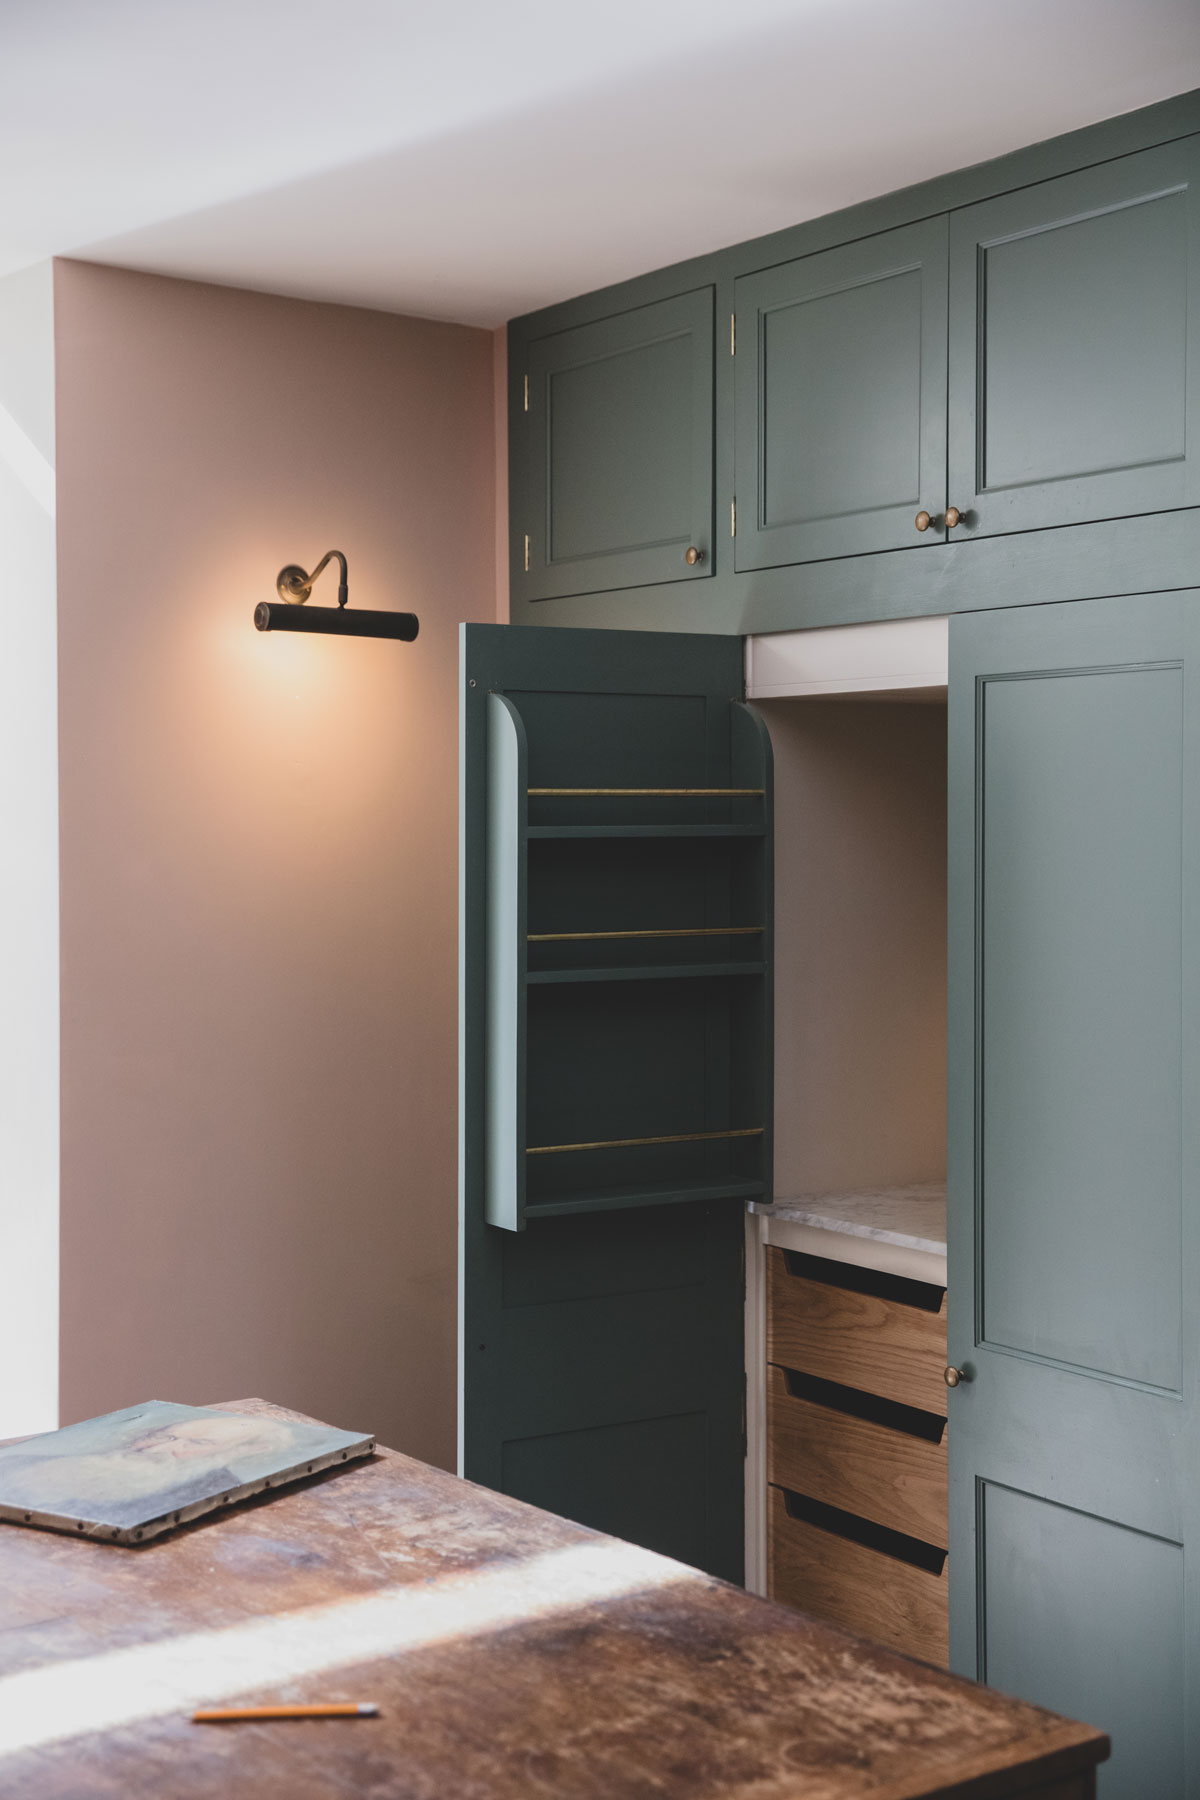 Bespoke kitchen shaker marble